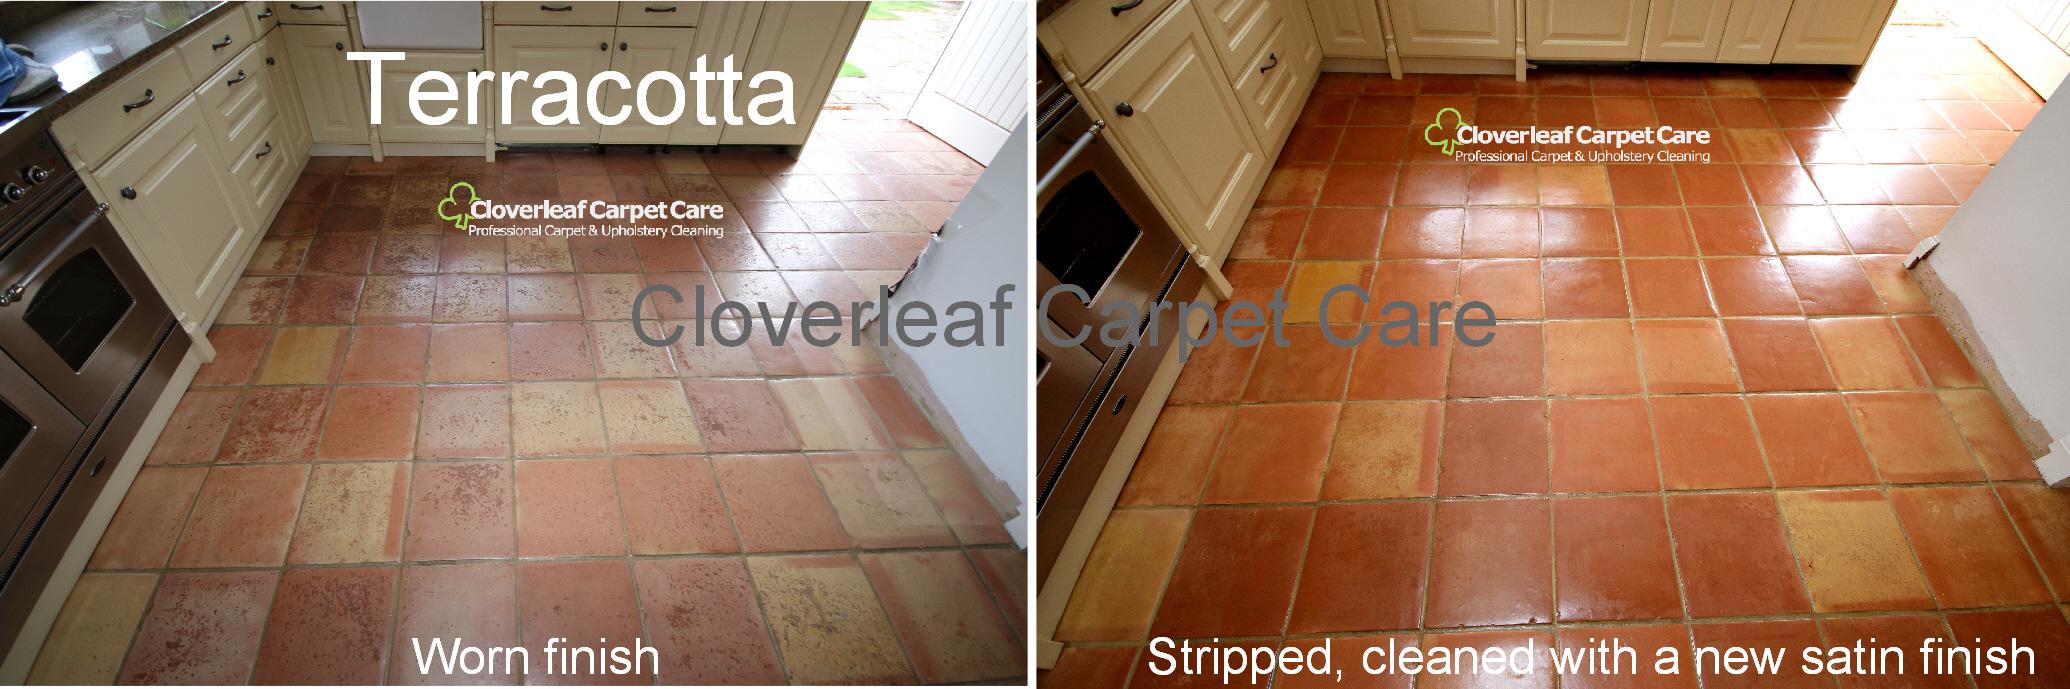 Terracotta-floors-cleaned-sealed-in Cheshire